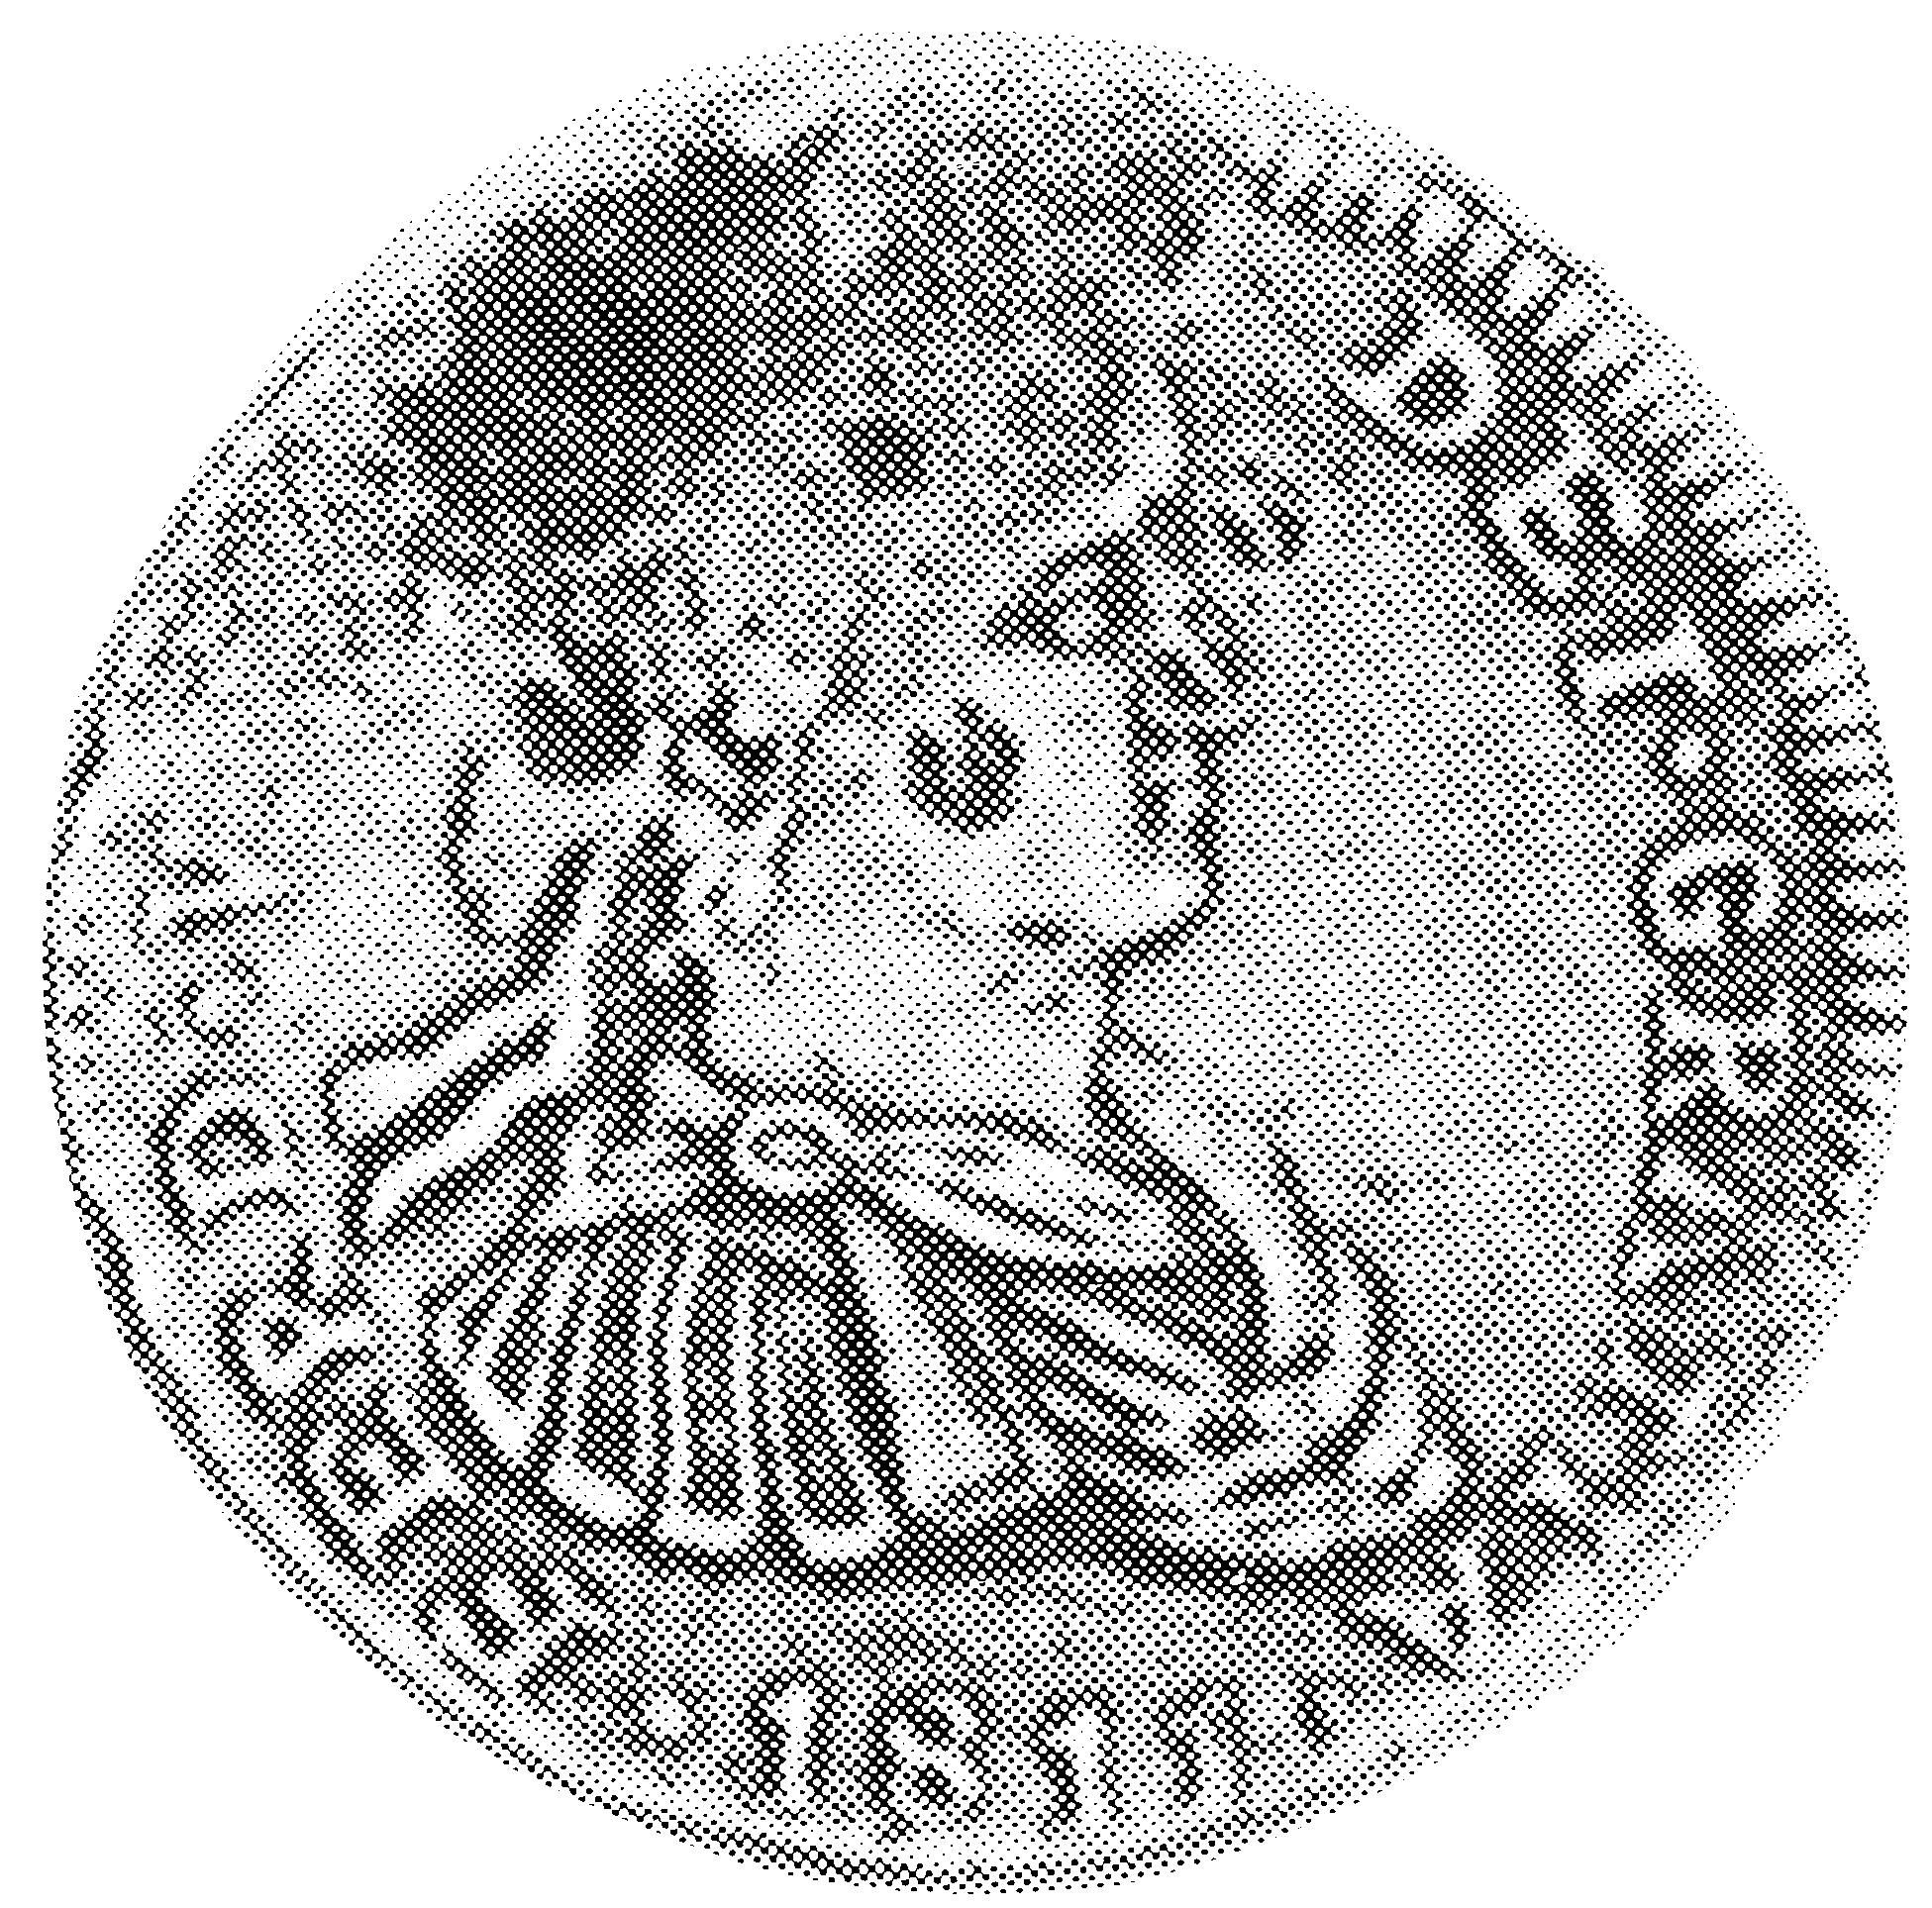 1811-1814 Mexico DURANGO 8 Reales obverse